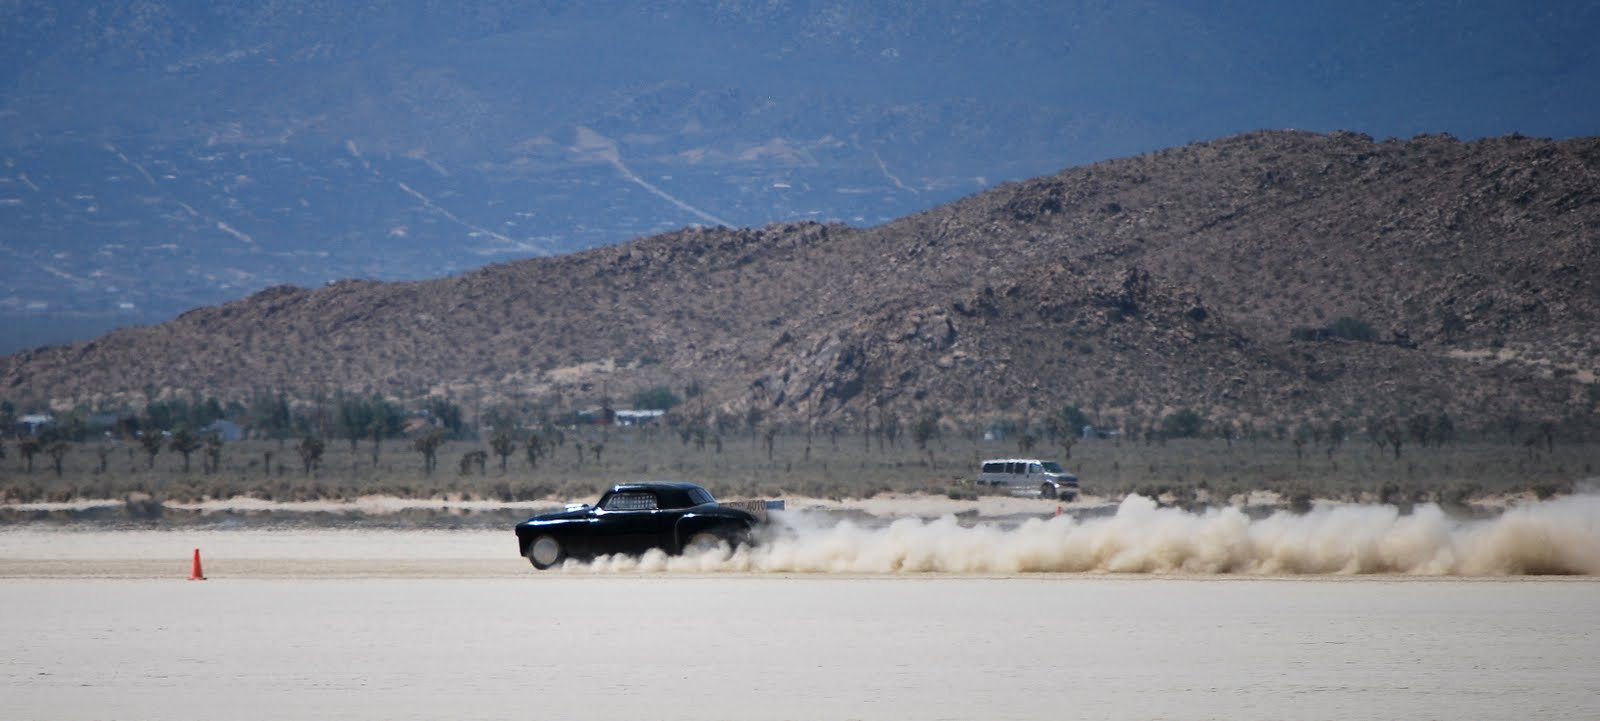 el mirage dry lake bed racing - photo #17